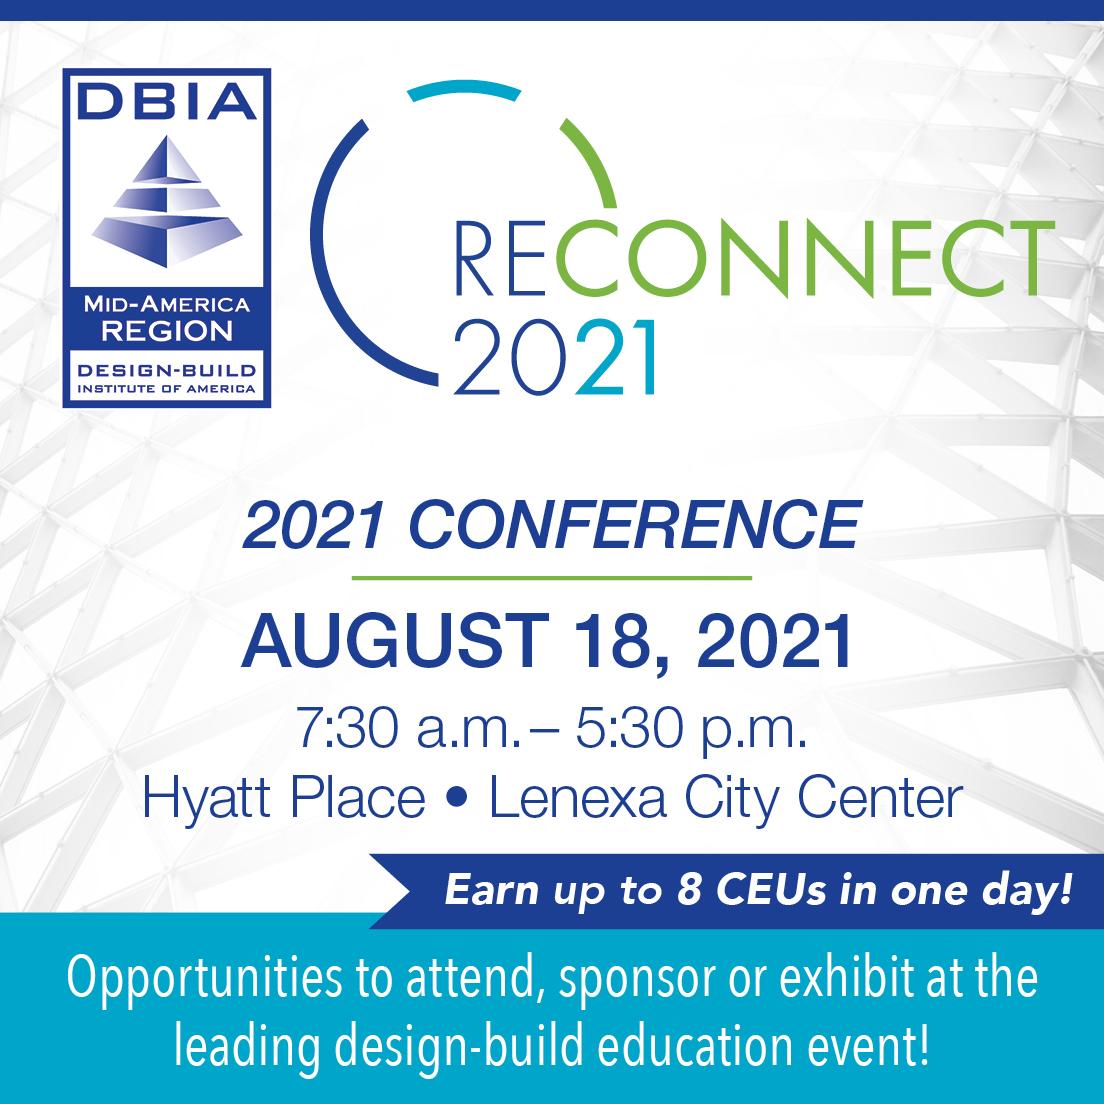 DBIA_2021RegionalConferenceAd(265x265)_v1C.jpg